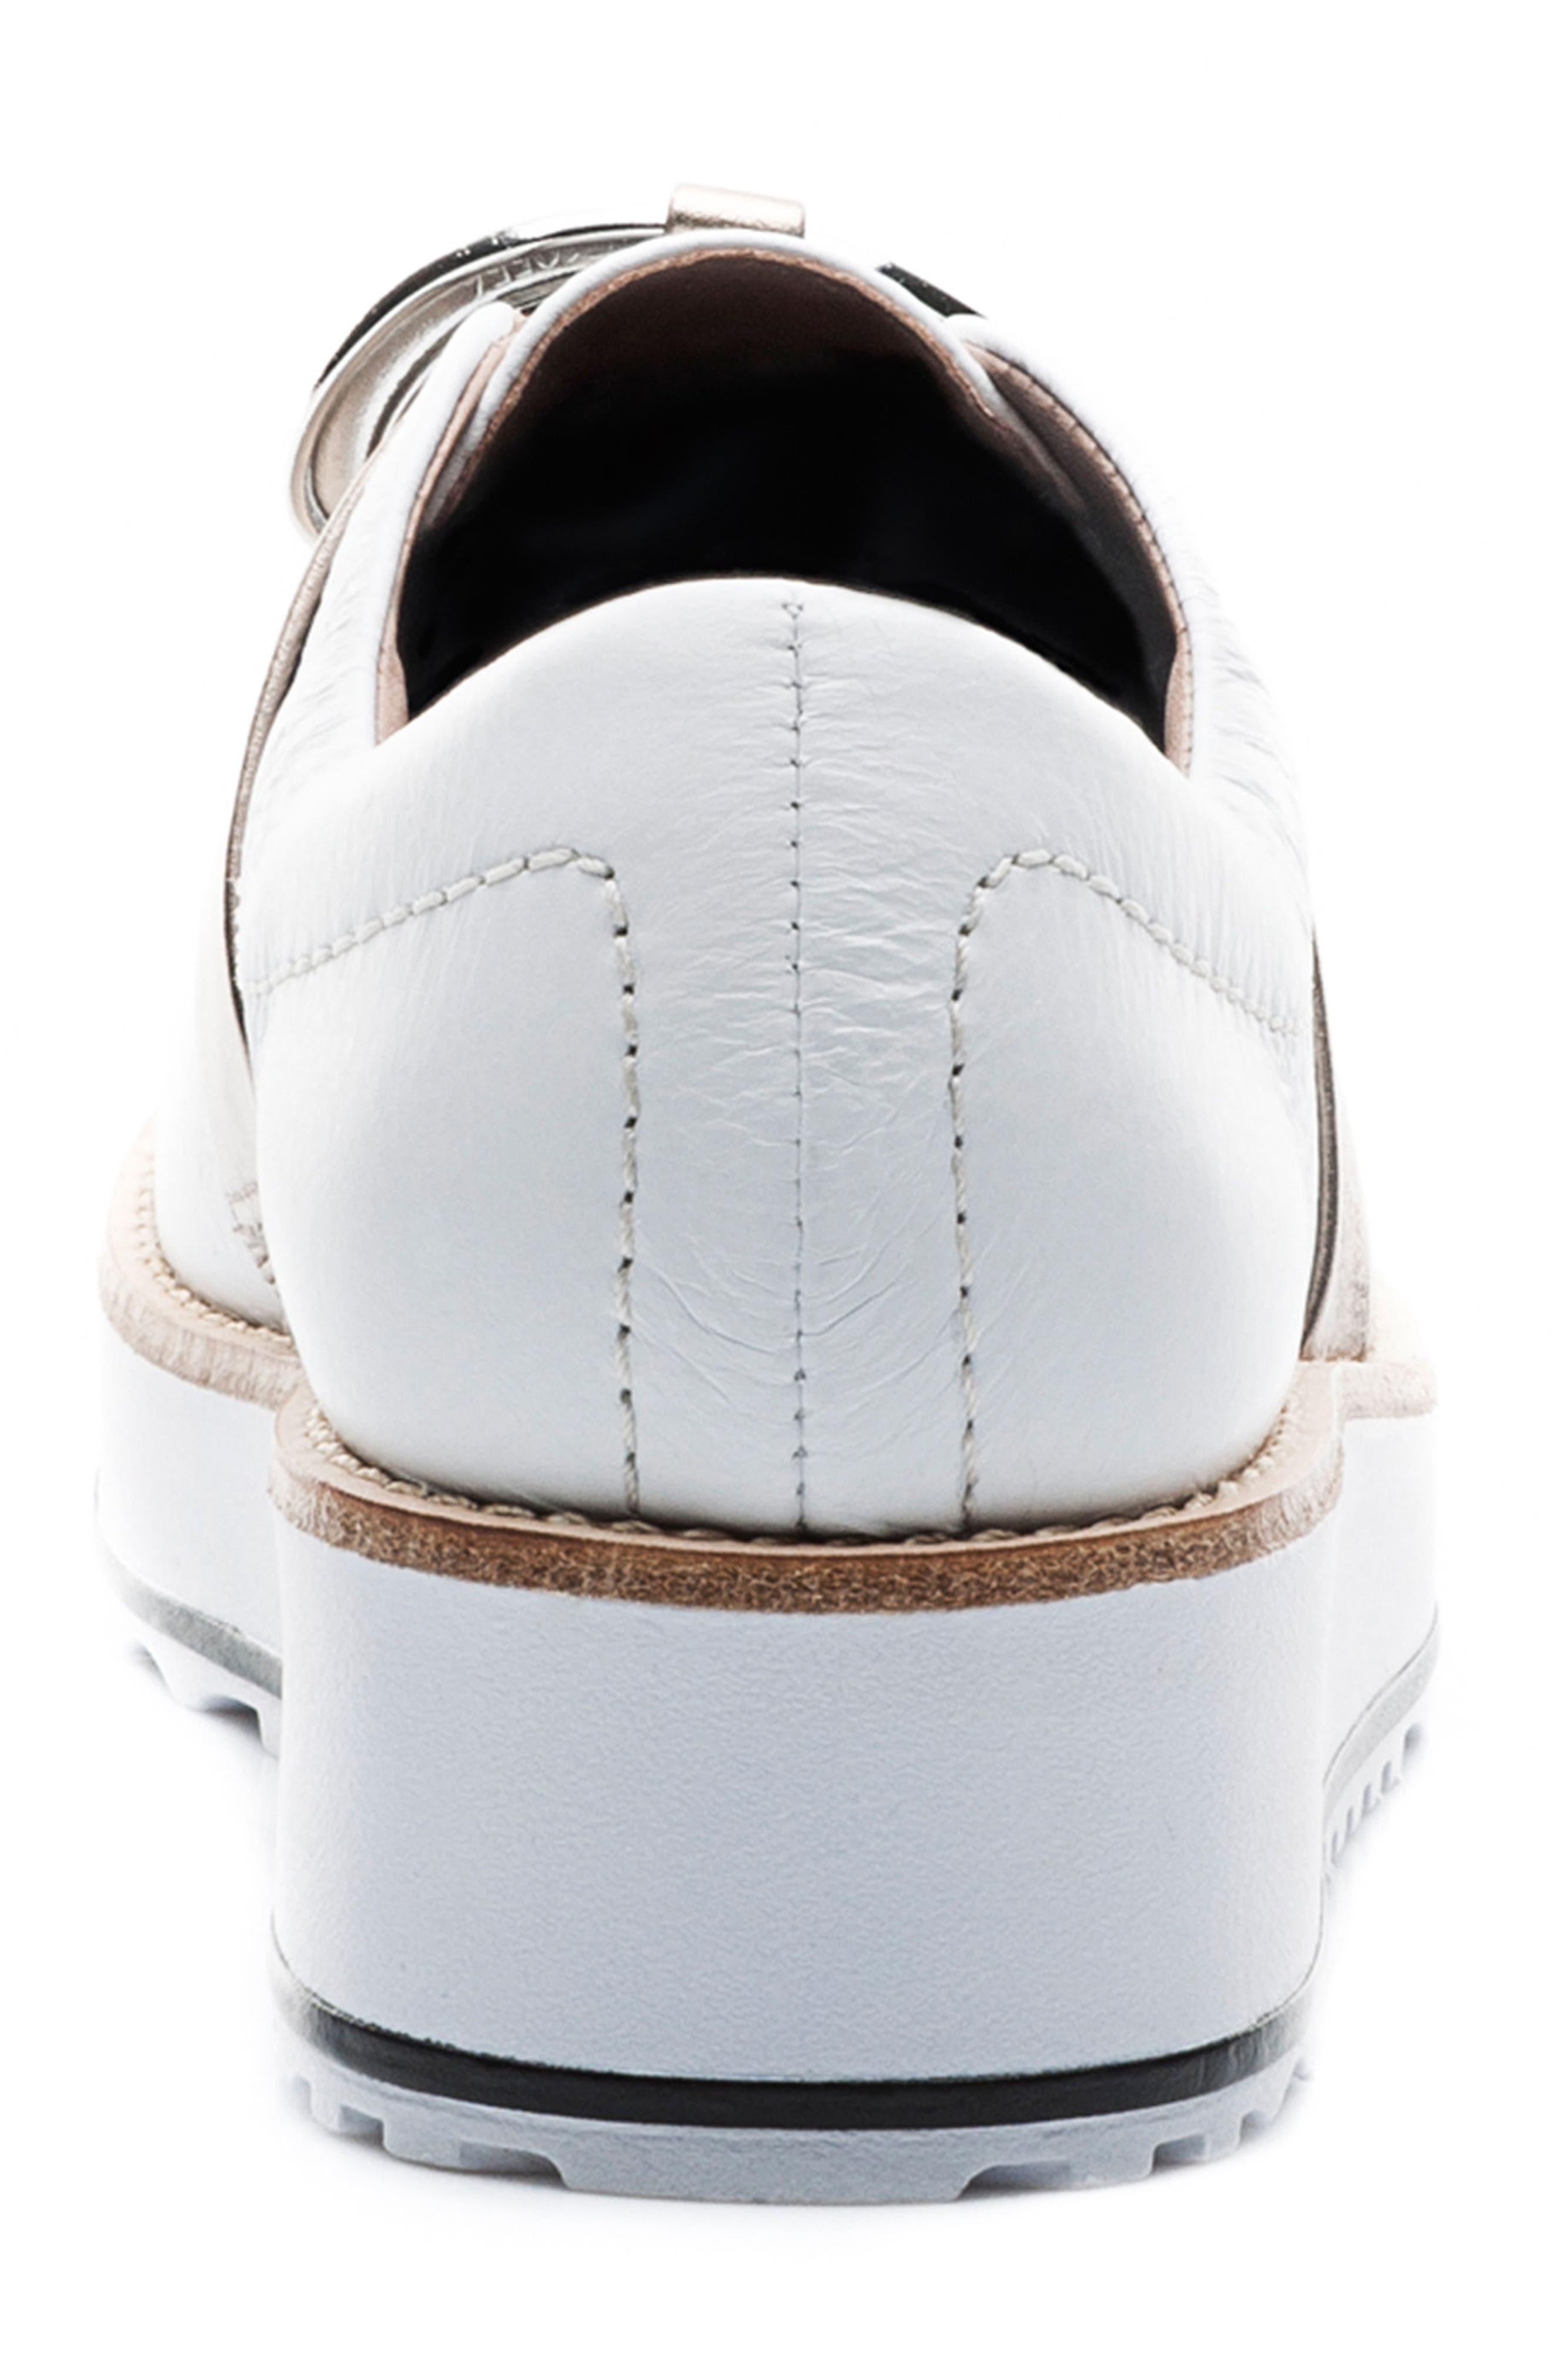 Susan Wedge Sneaker,                             Alternate thumbnail 7, color,                             100